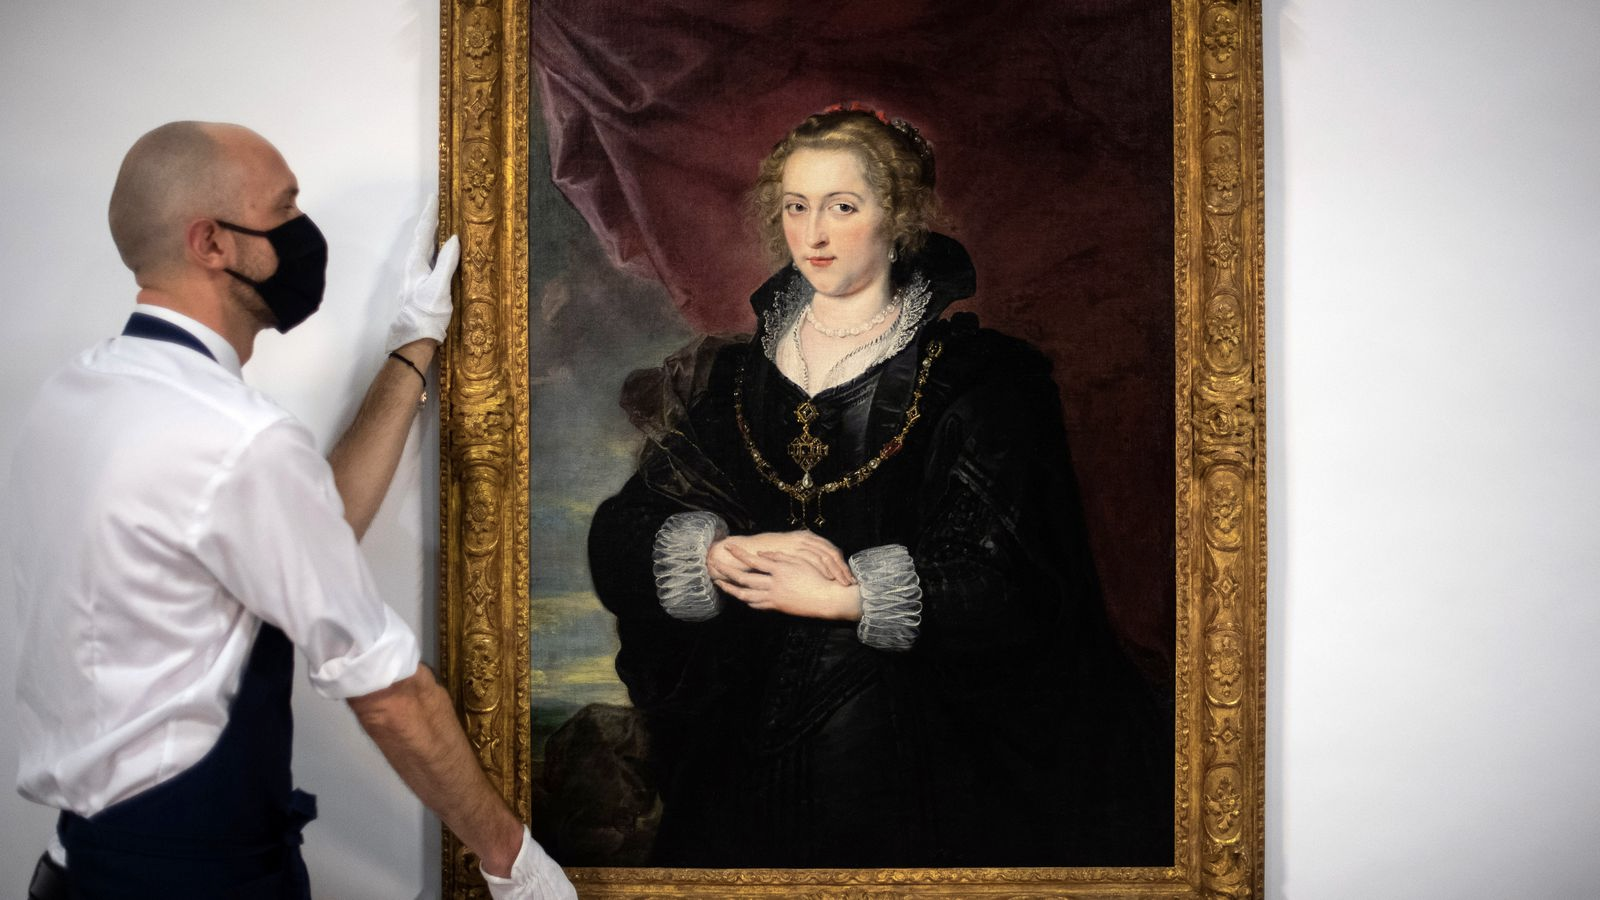 У Лондоні знайшли втрачену картину Рубенса